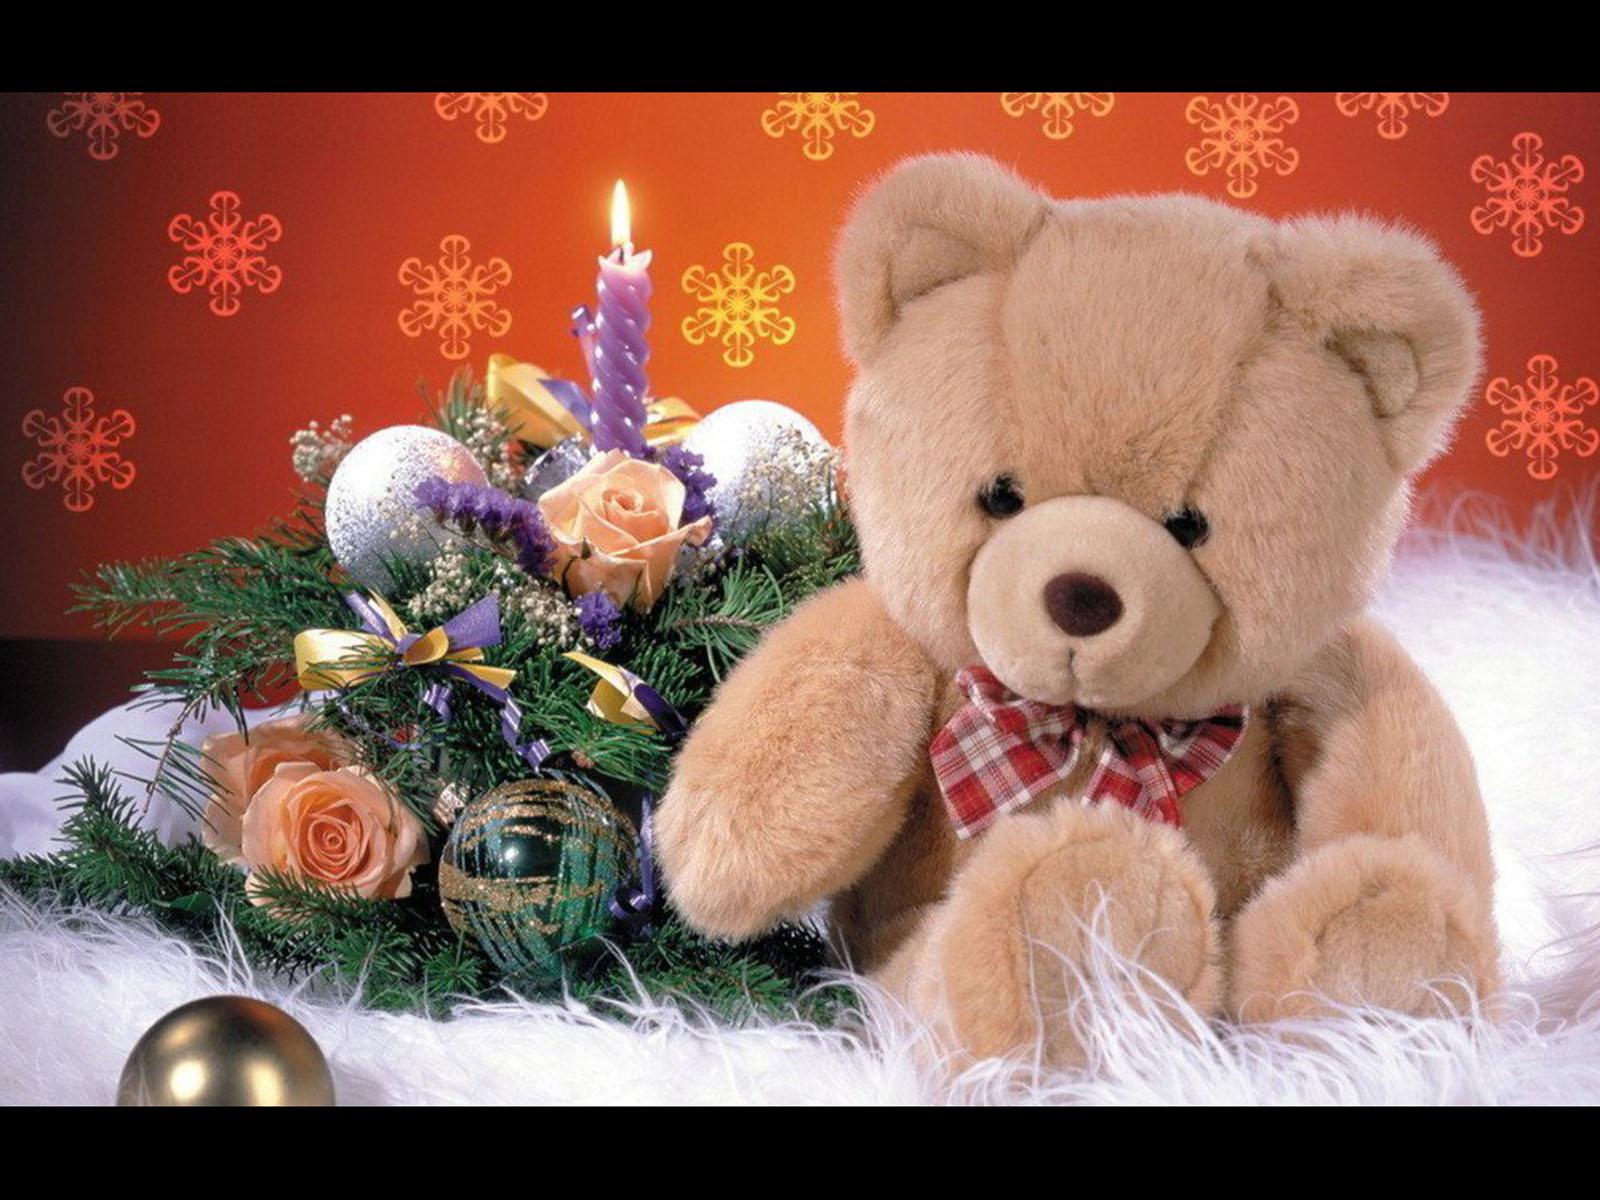 Wallpapers Teddy Bear Wallpapers